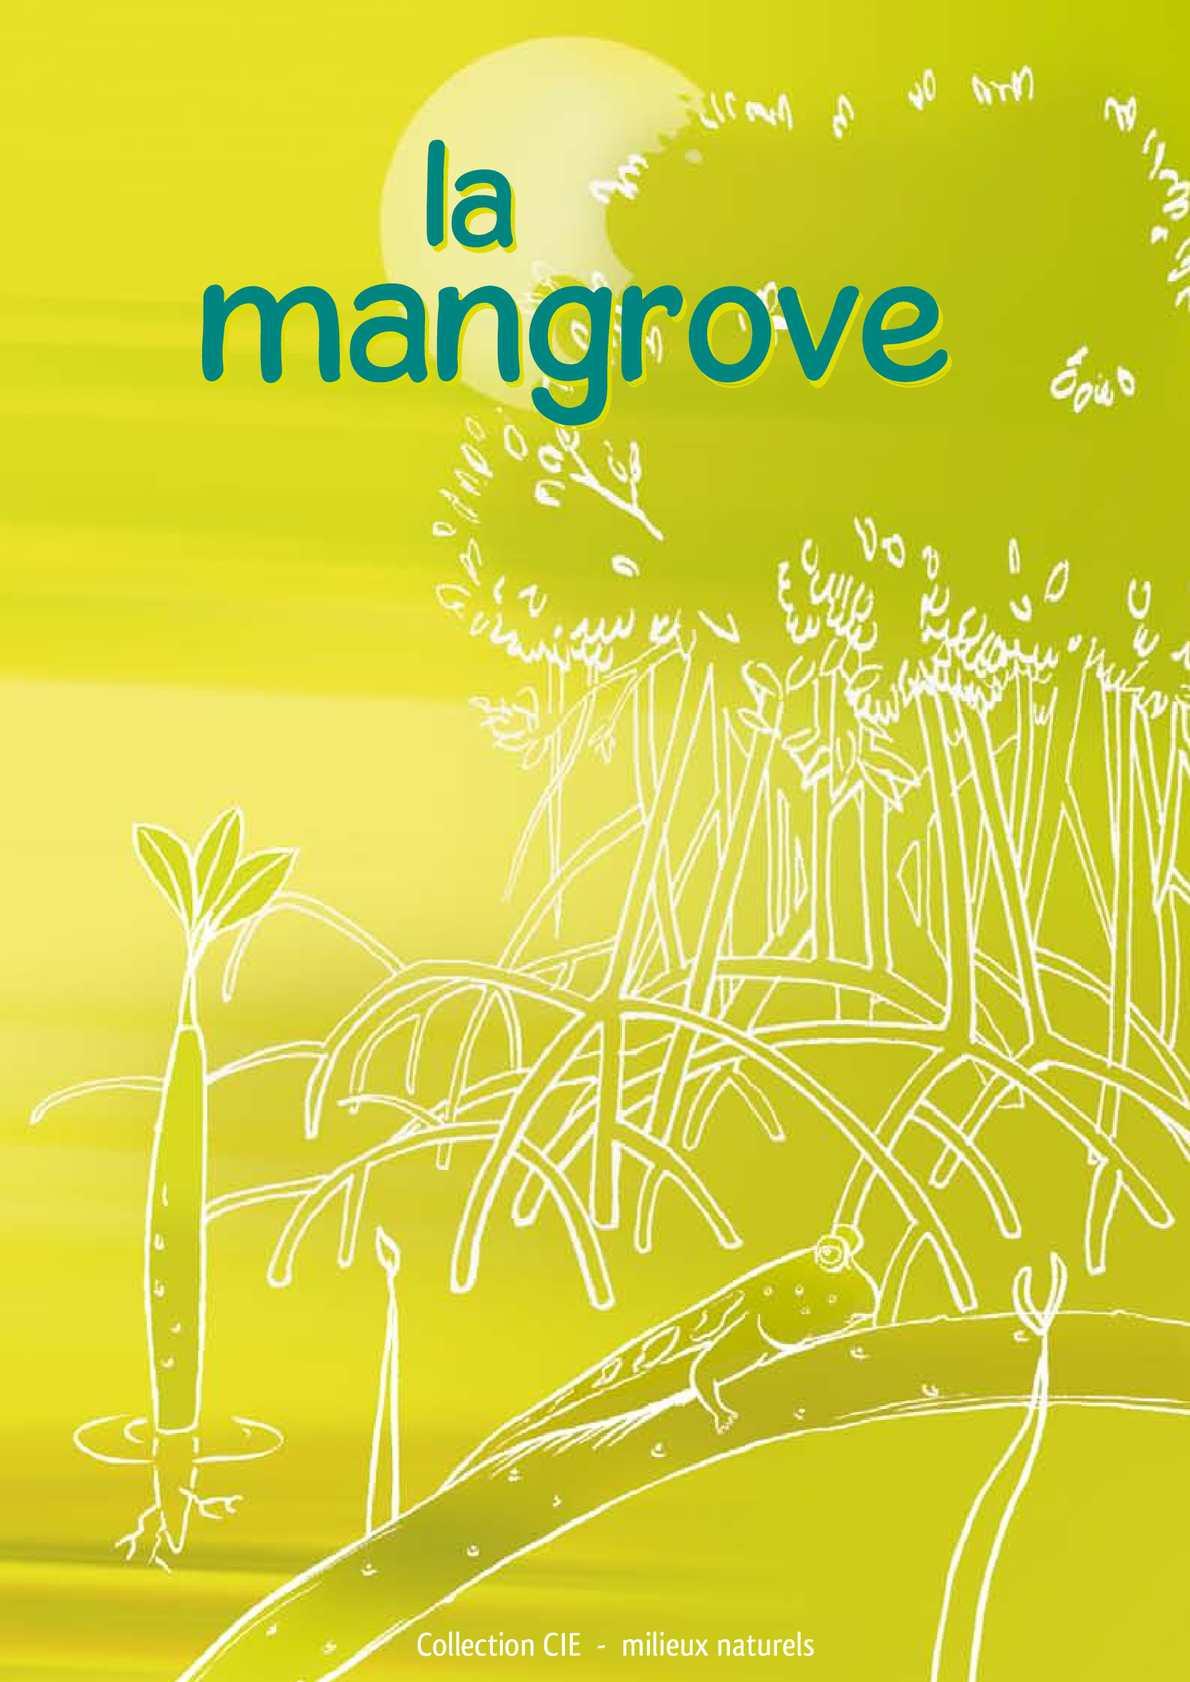 La mangrove - Collection CIE